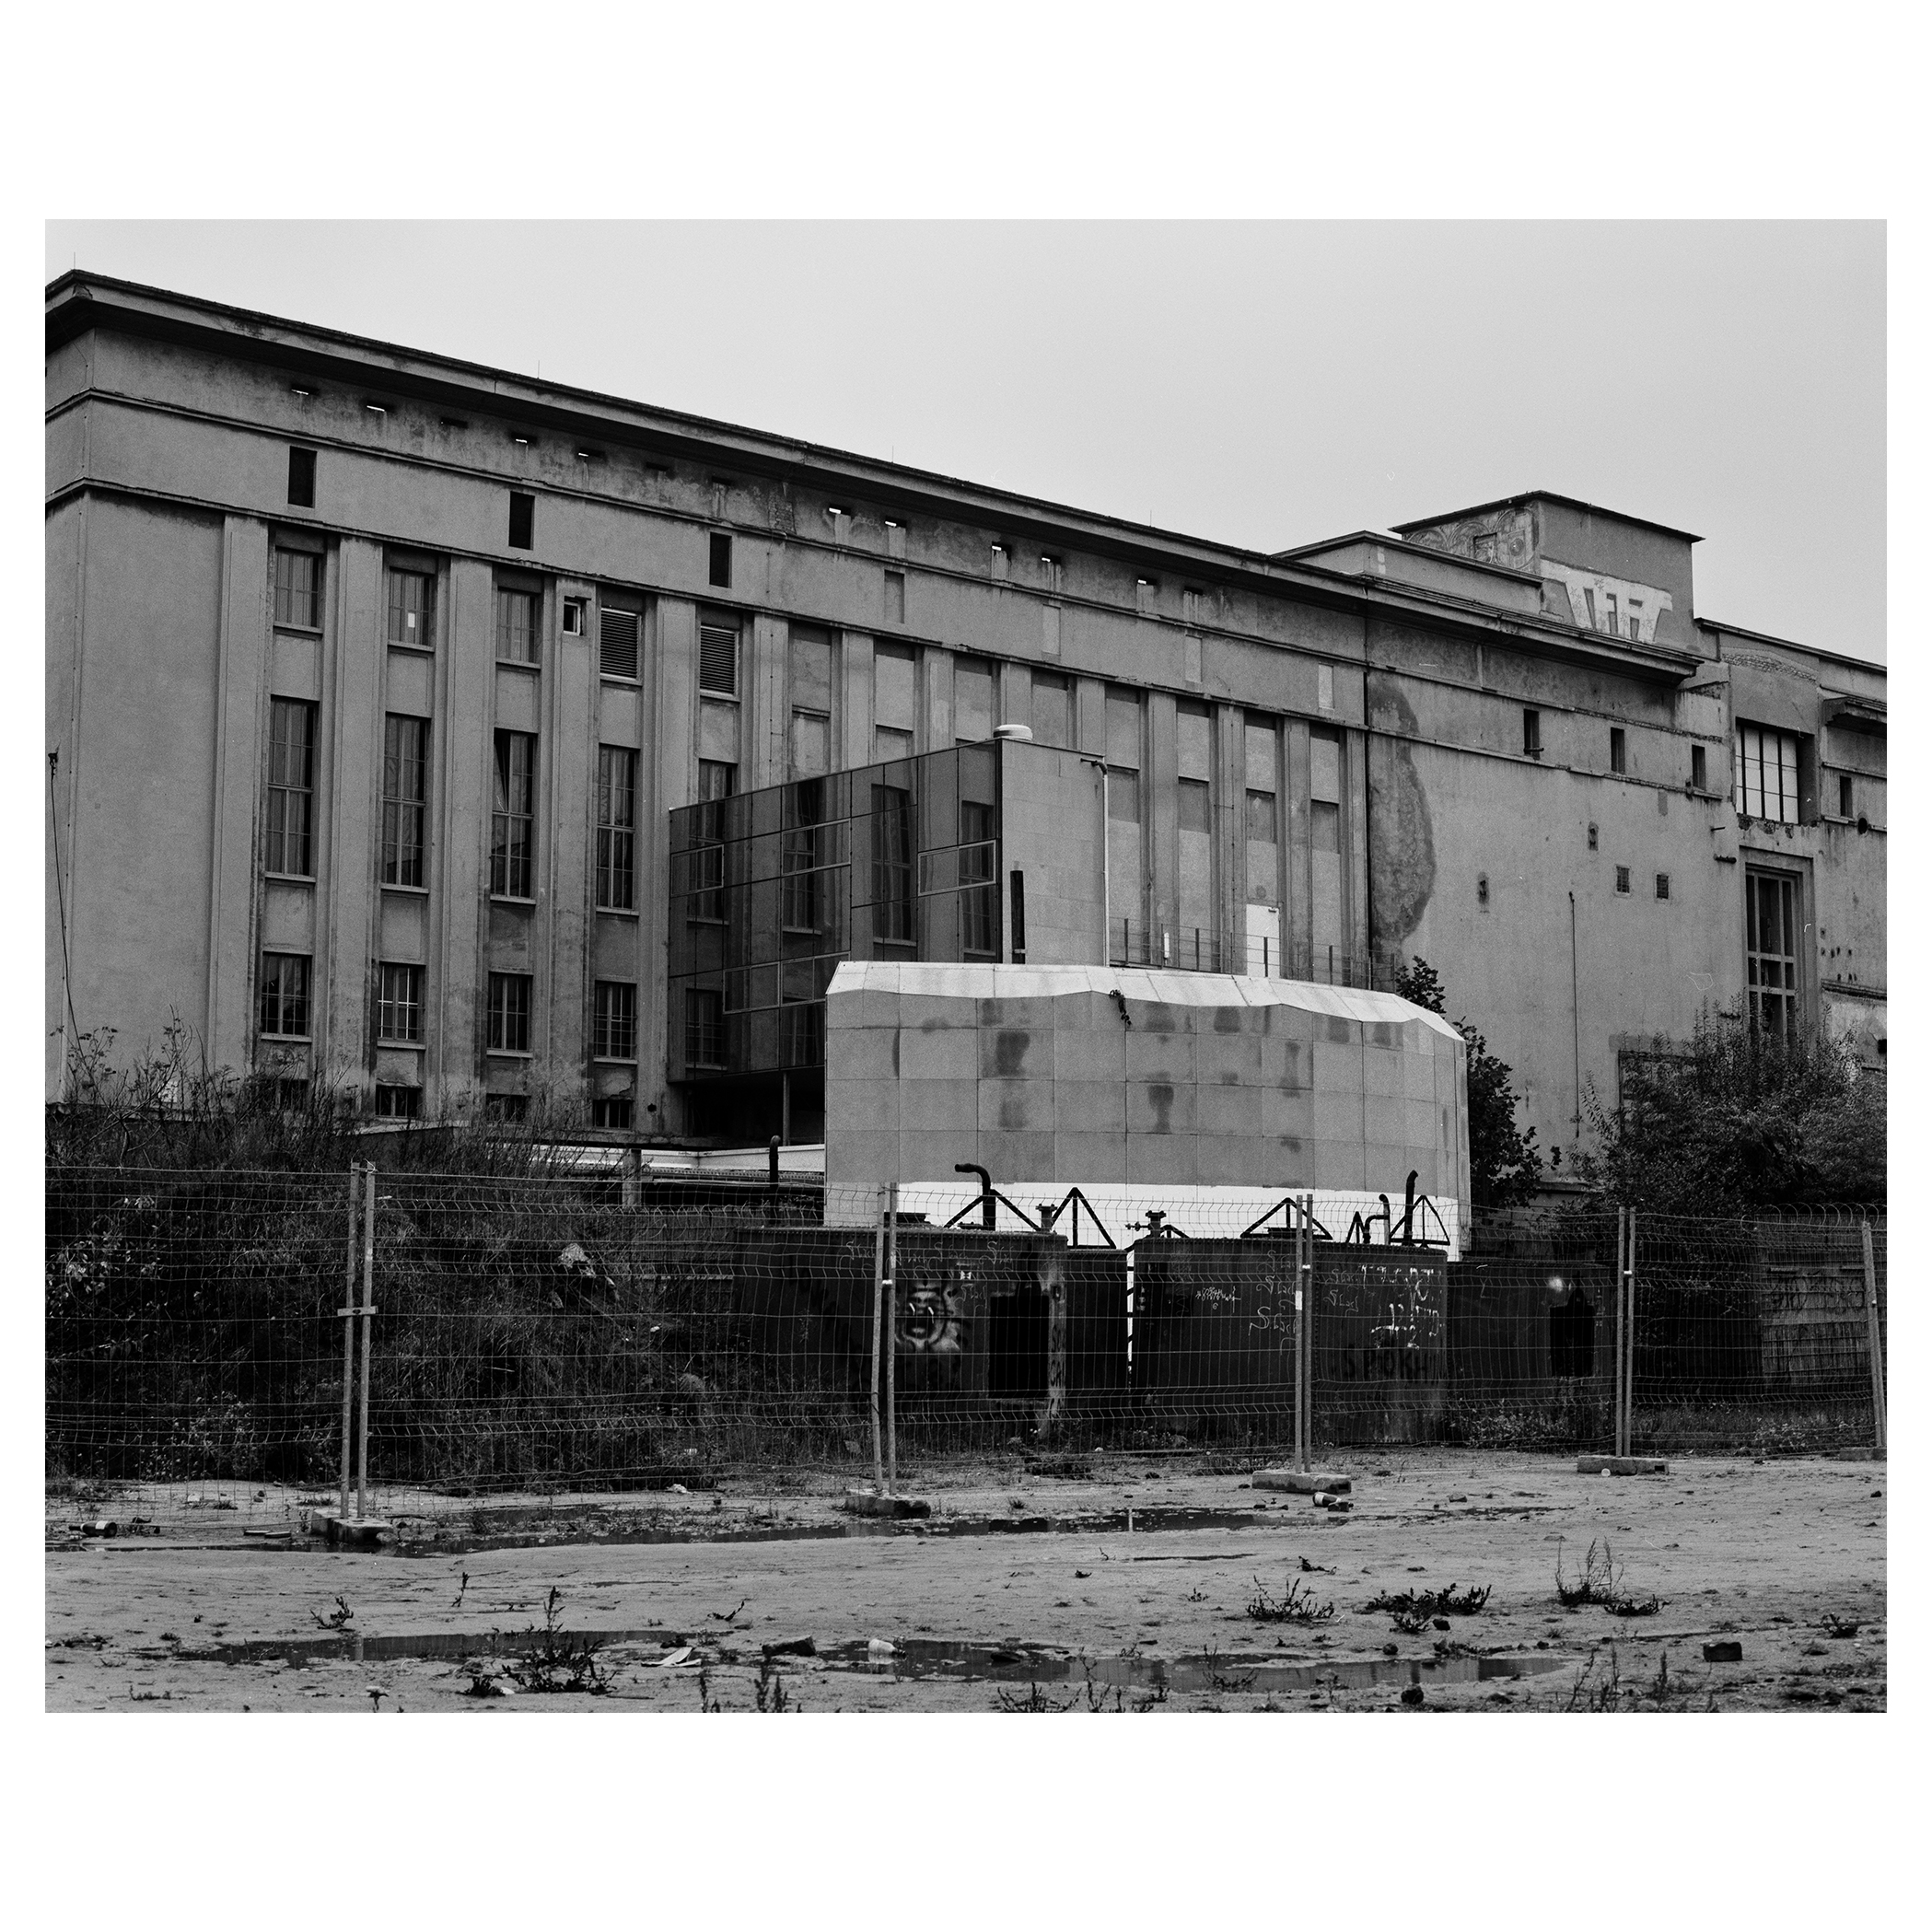 Berghain/Panorama (Side View), 2010